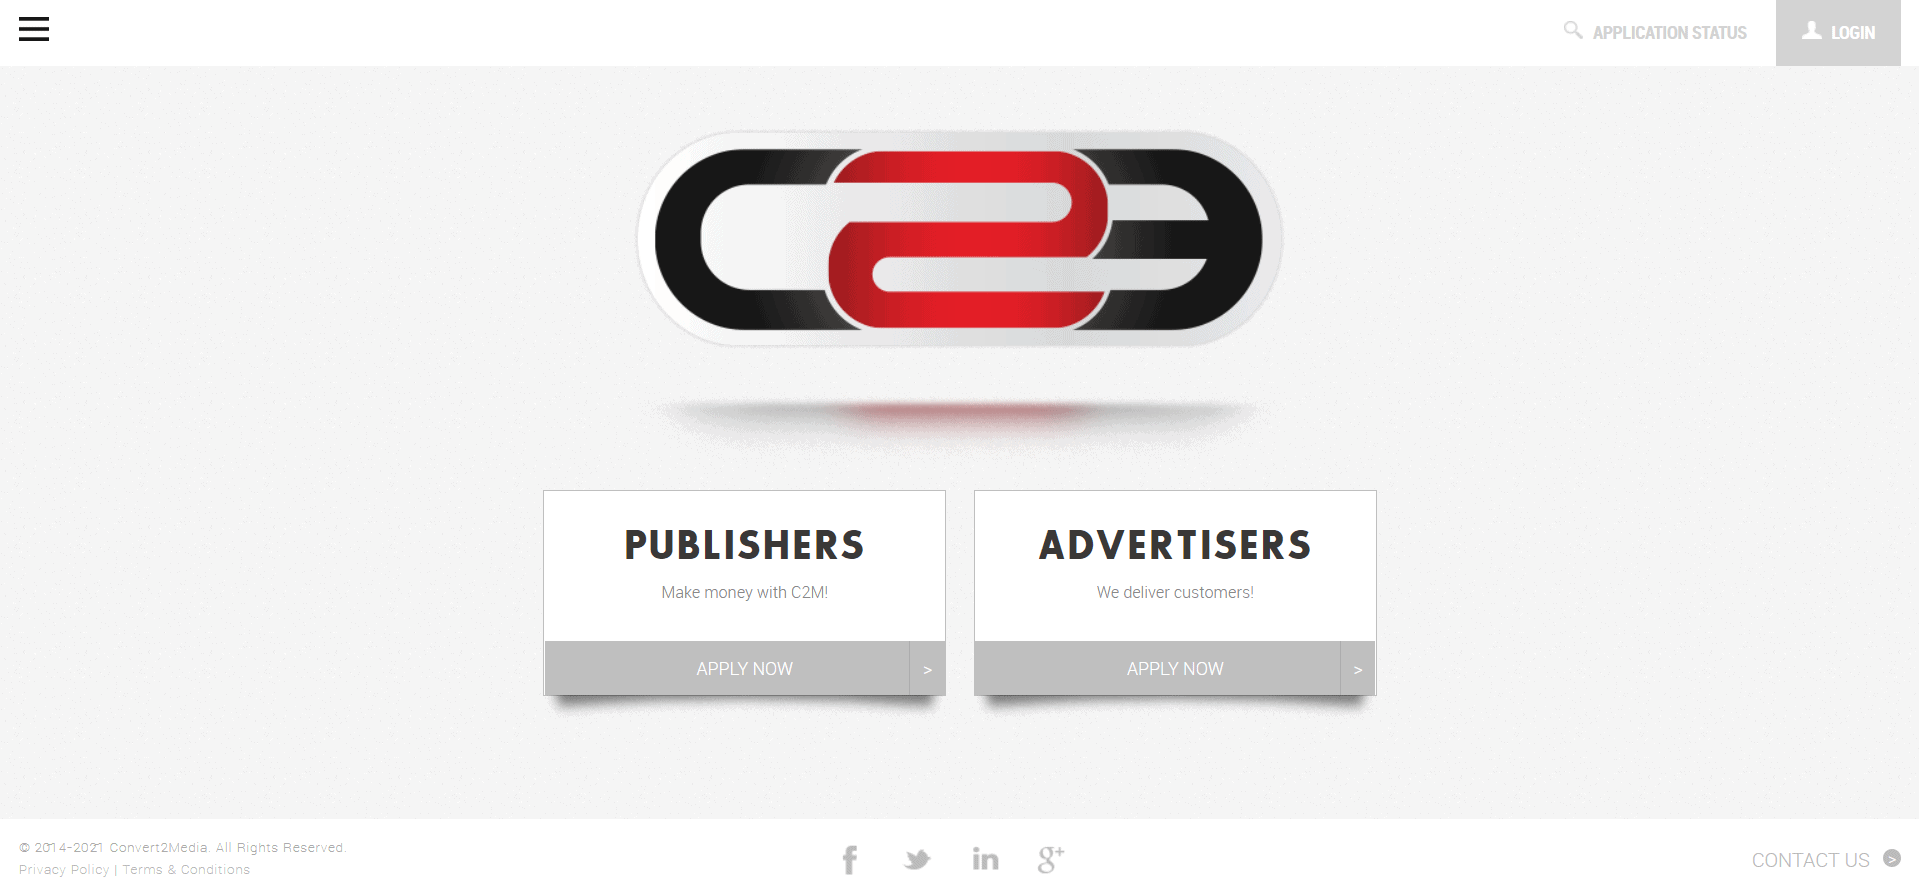 Convert2Media - Best Affiliate Network